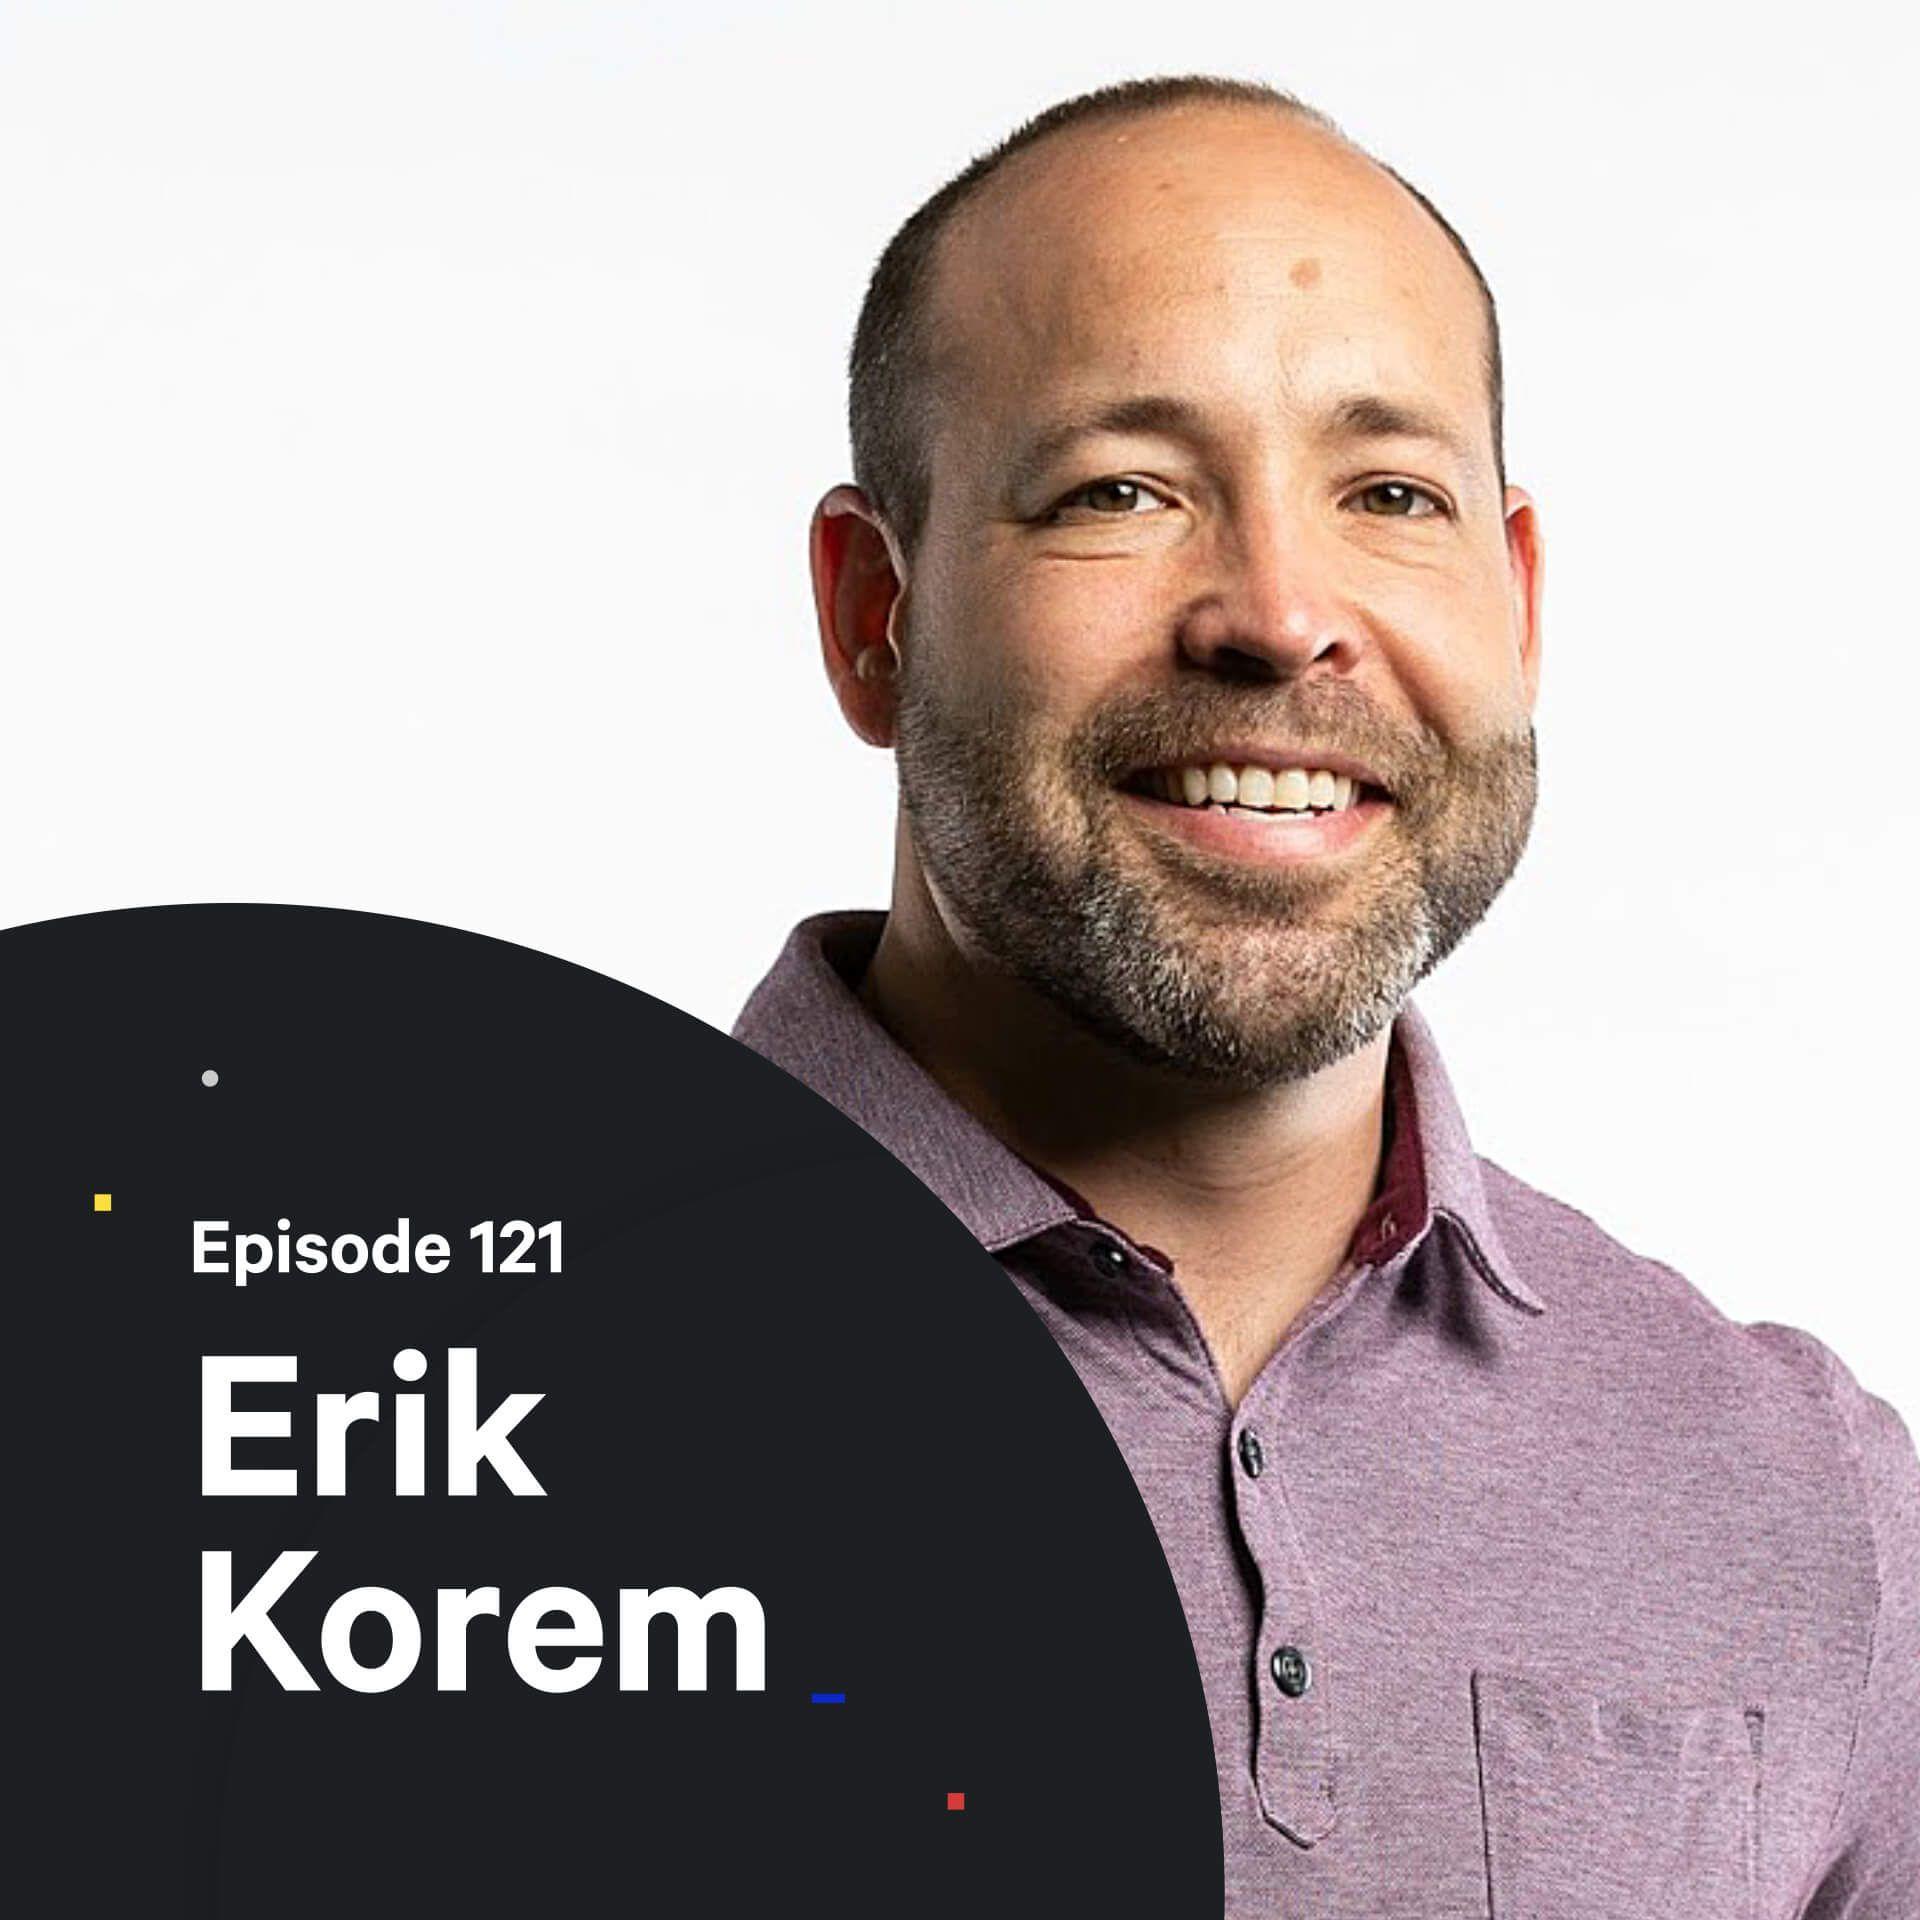 121 - High Performance Creativity — with Erik Korem